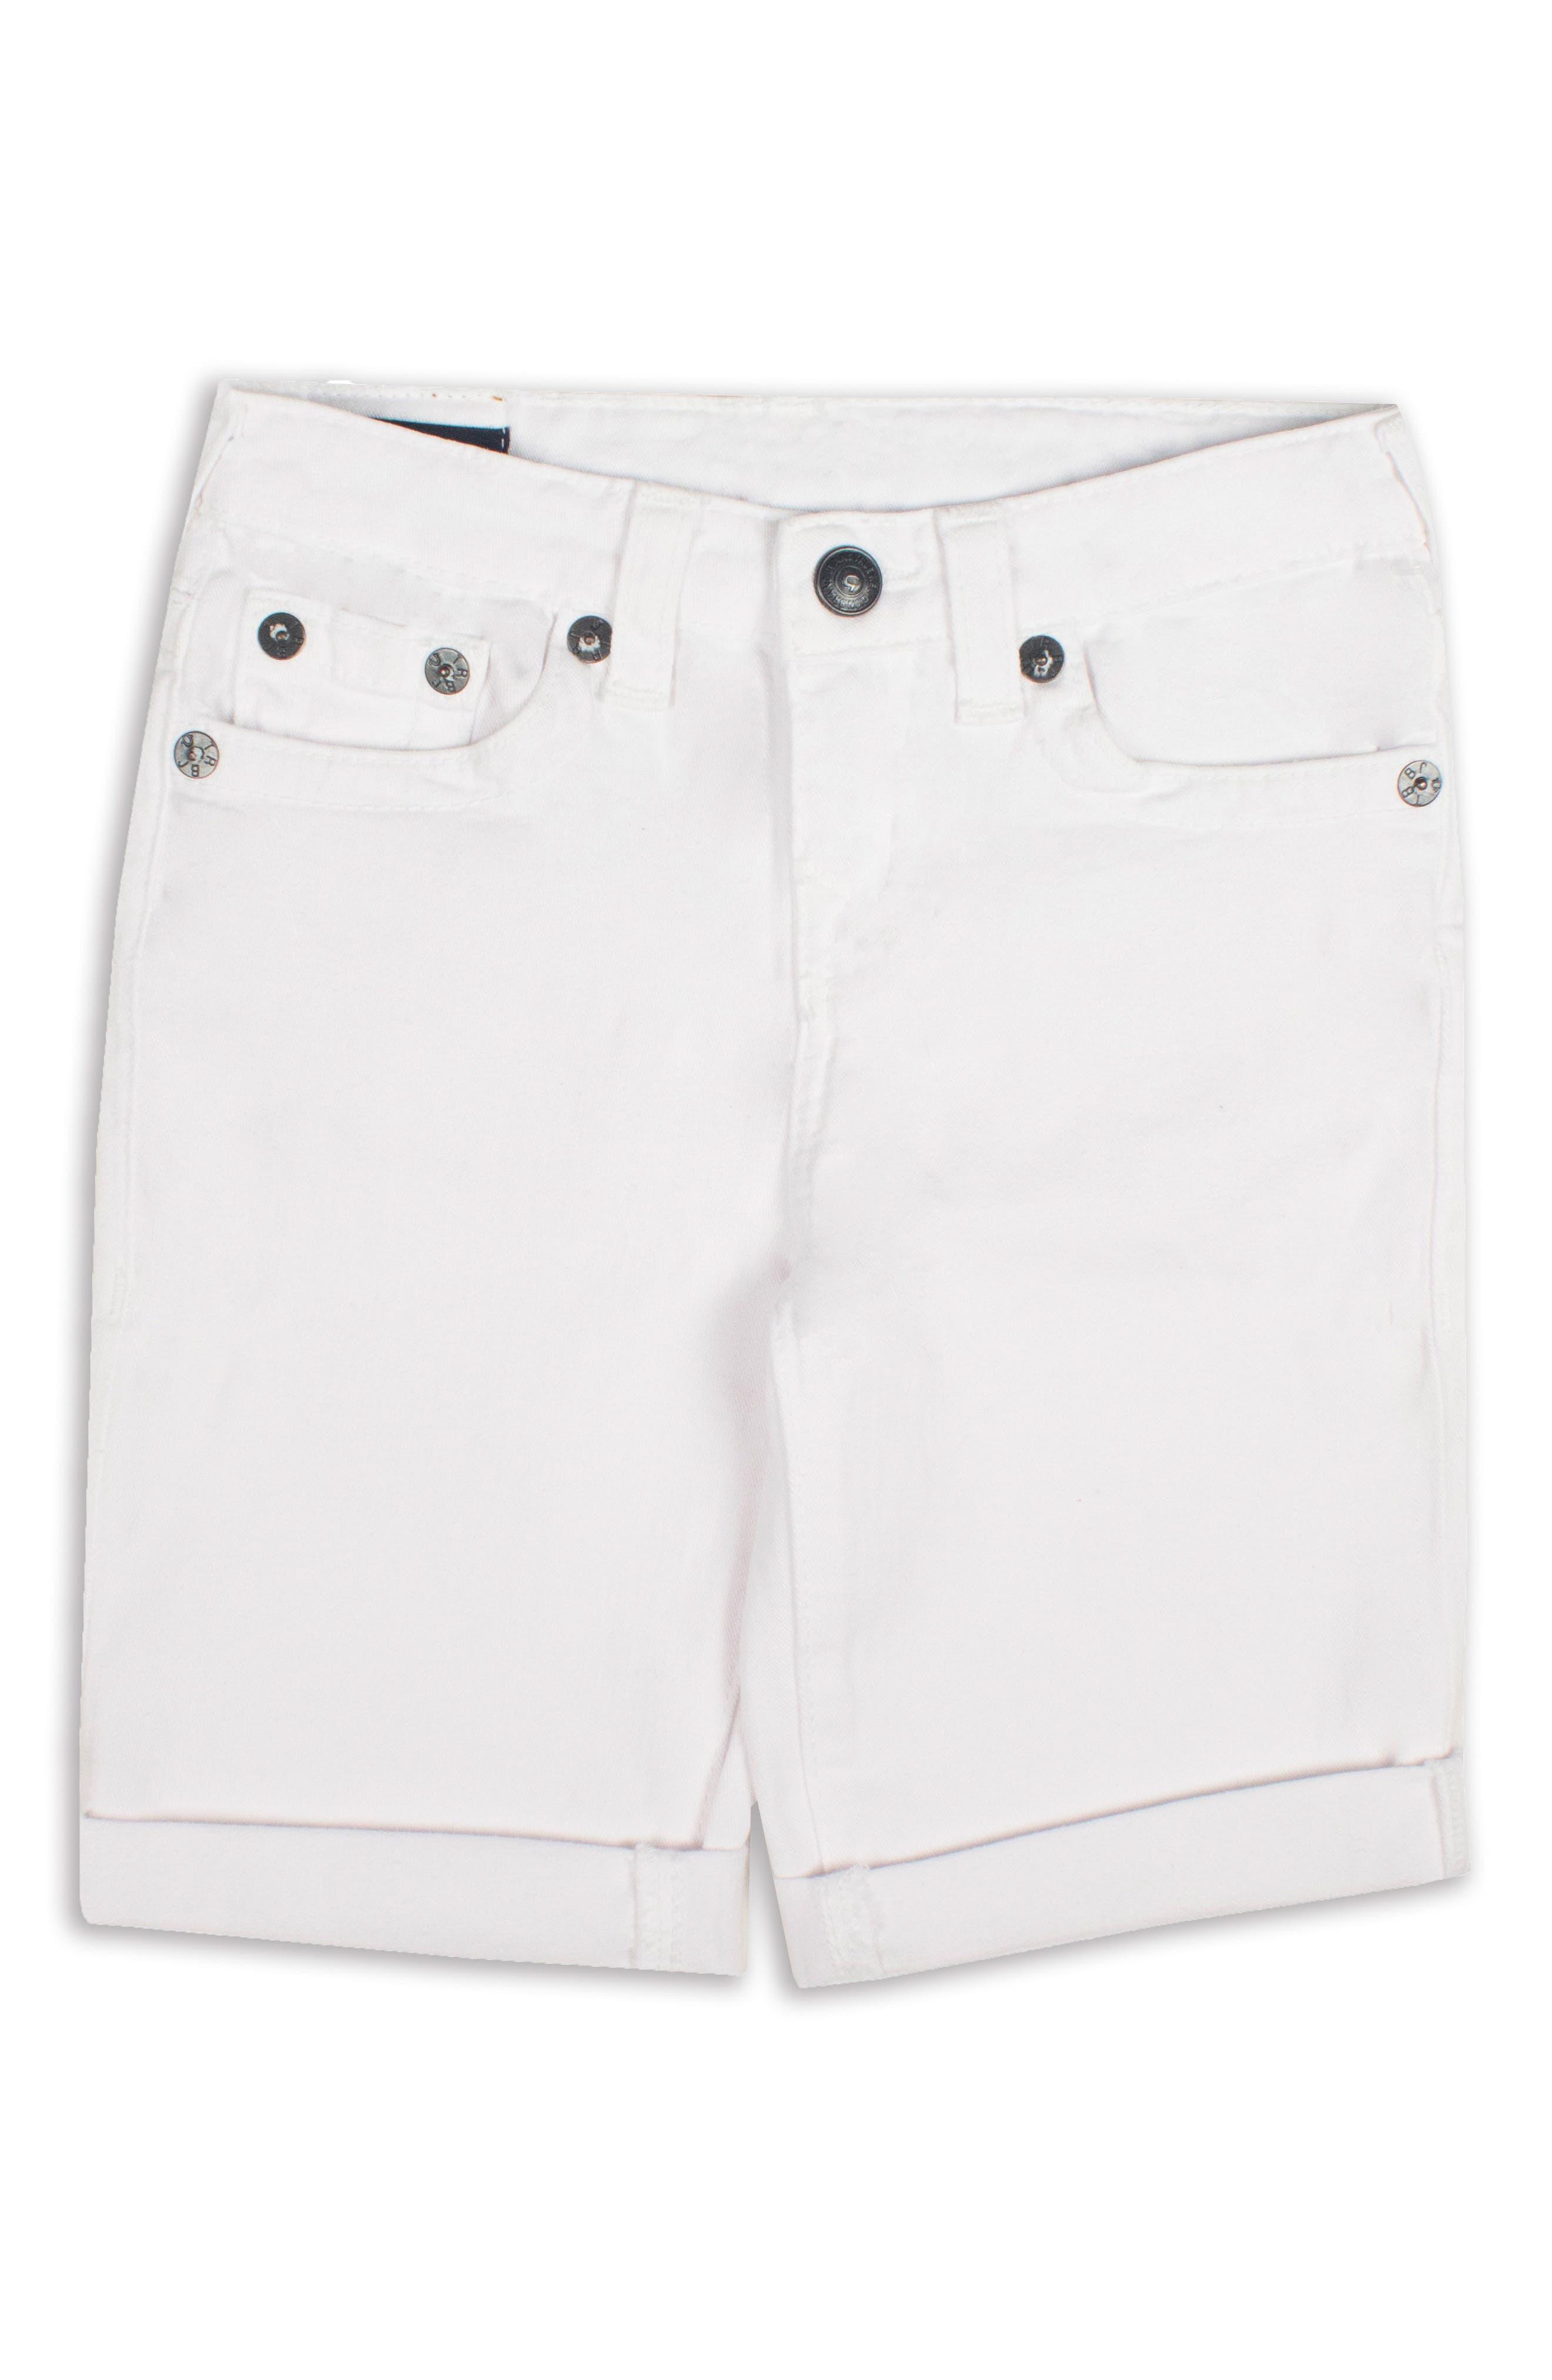 Geno Denim Shorts,                             Main thumbnail 1, color,                             White